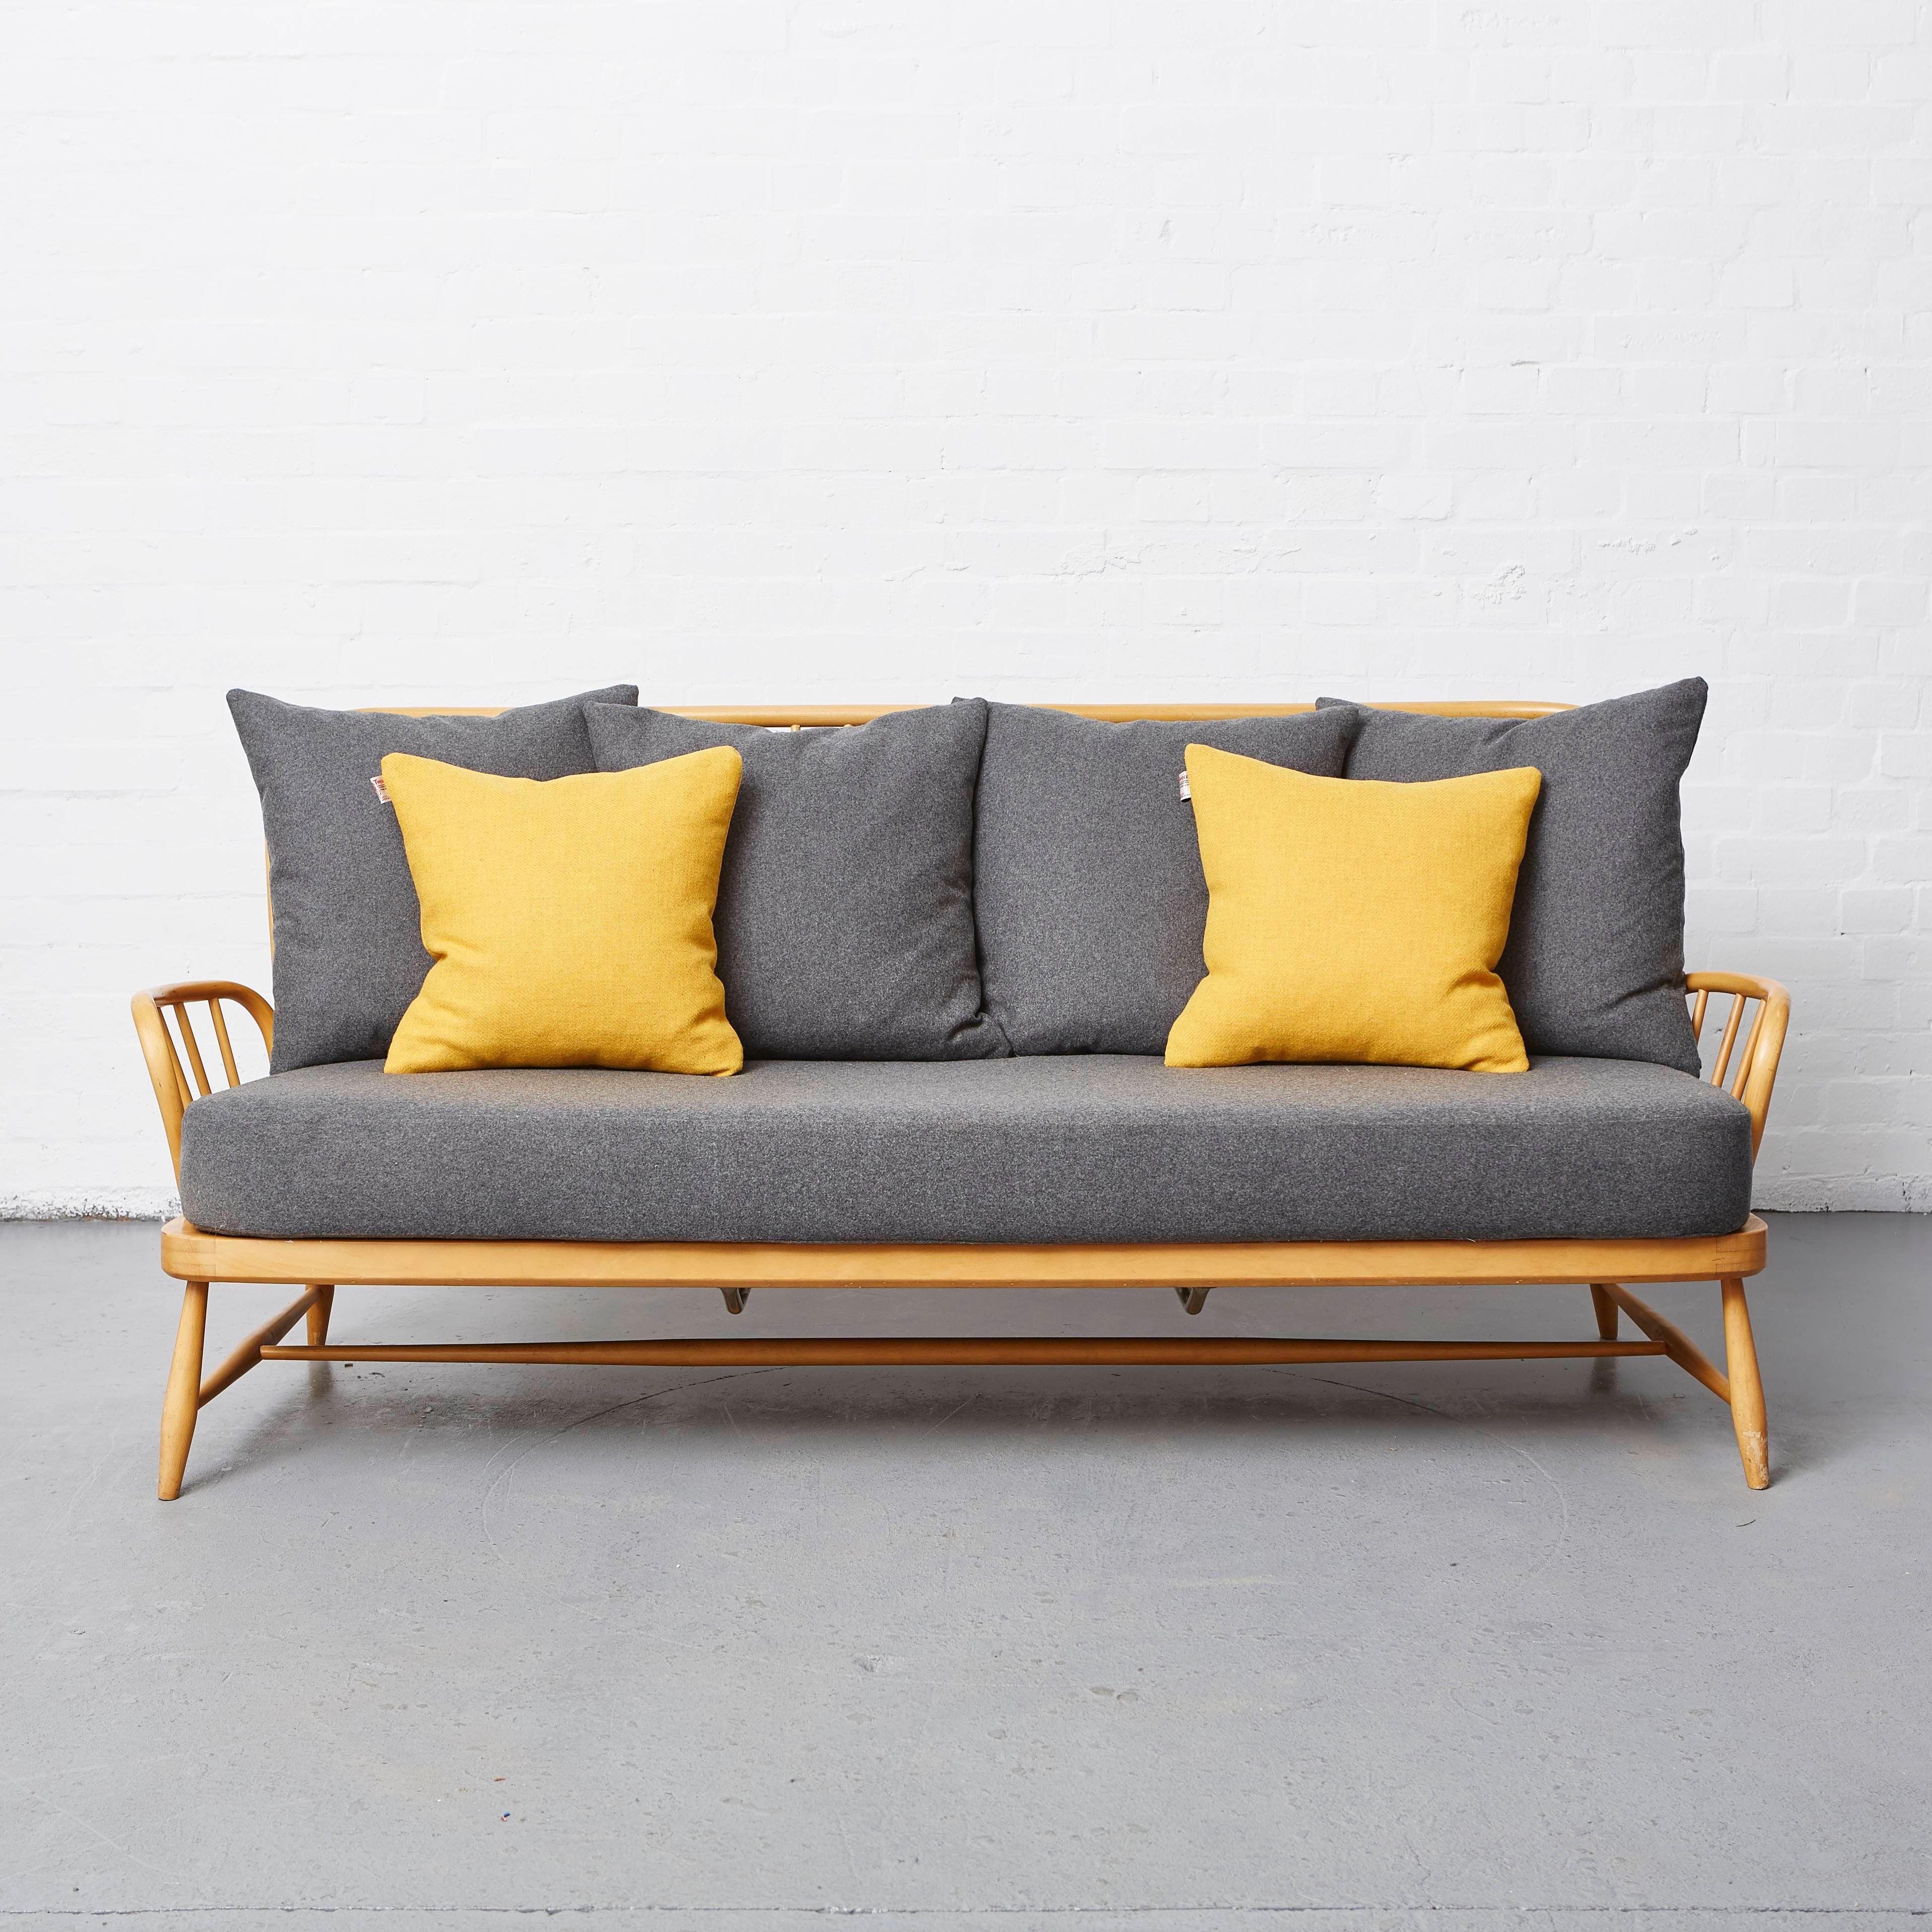 Ercol Sofa Furniture Settee Kitchen Cupboards